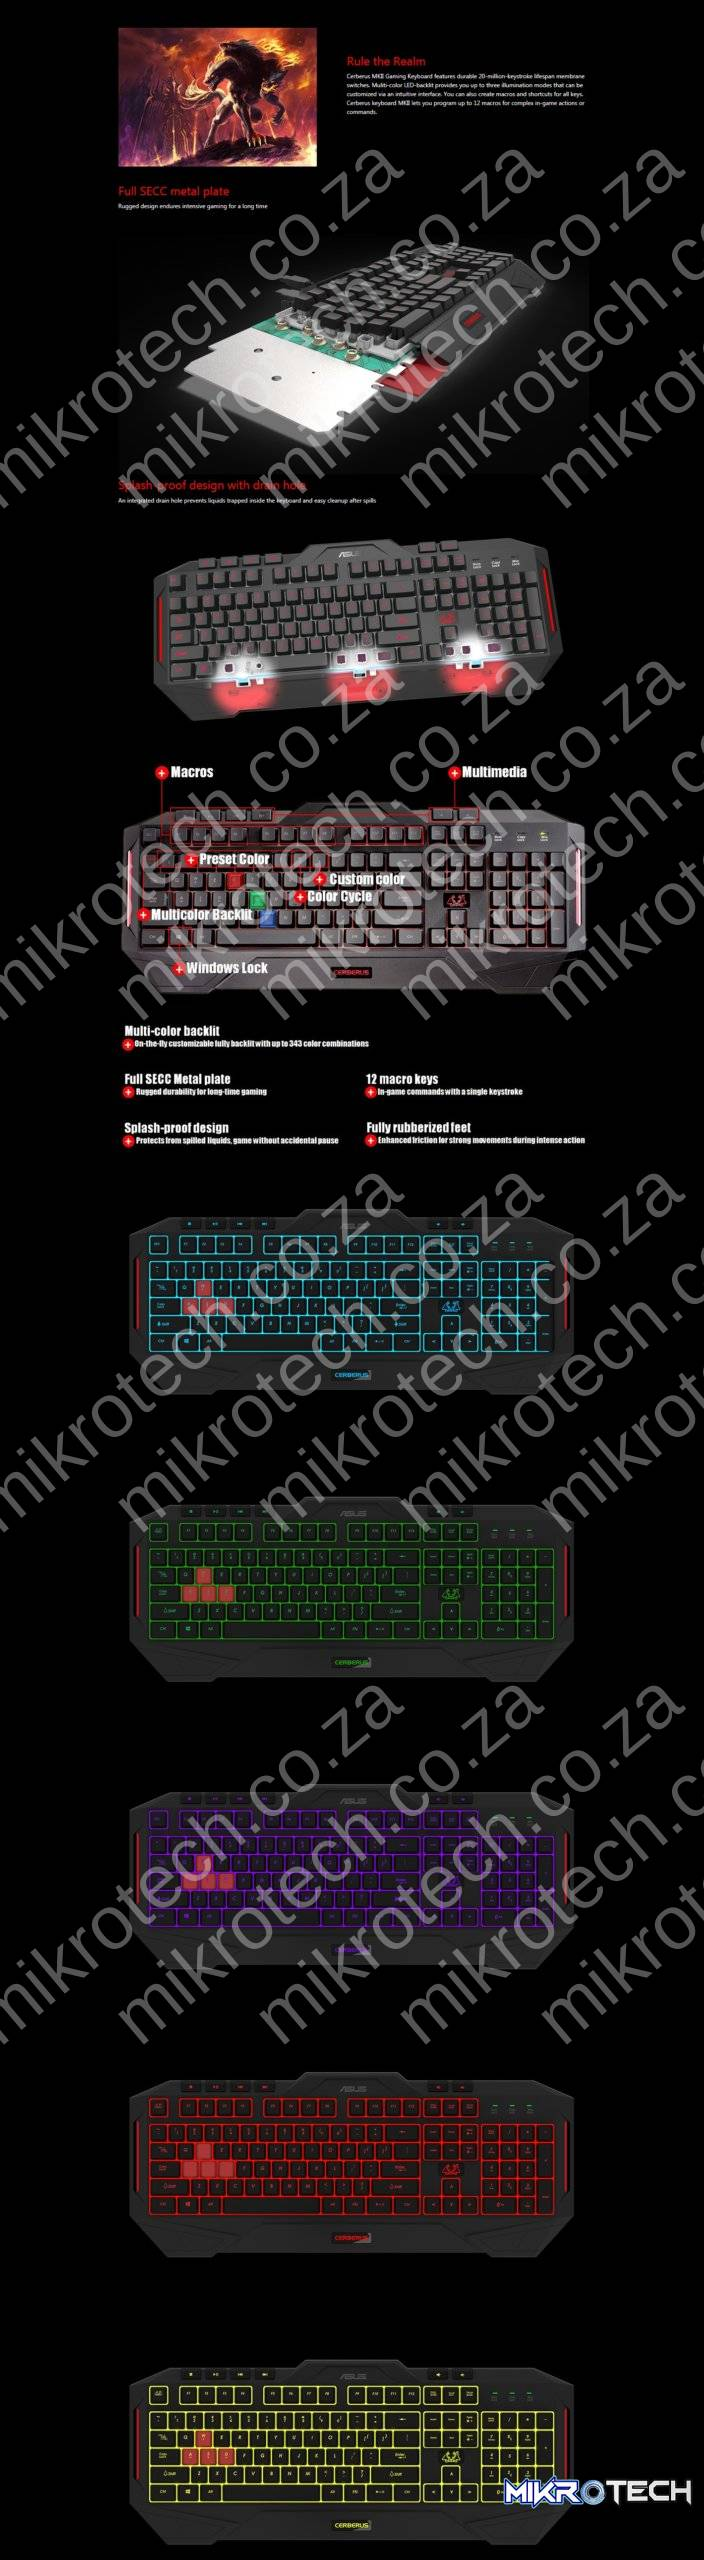 Asus Cerberus Keyboard MKII RGB LED Backlit Membrane Gaming Keyboard